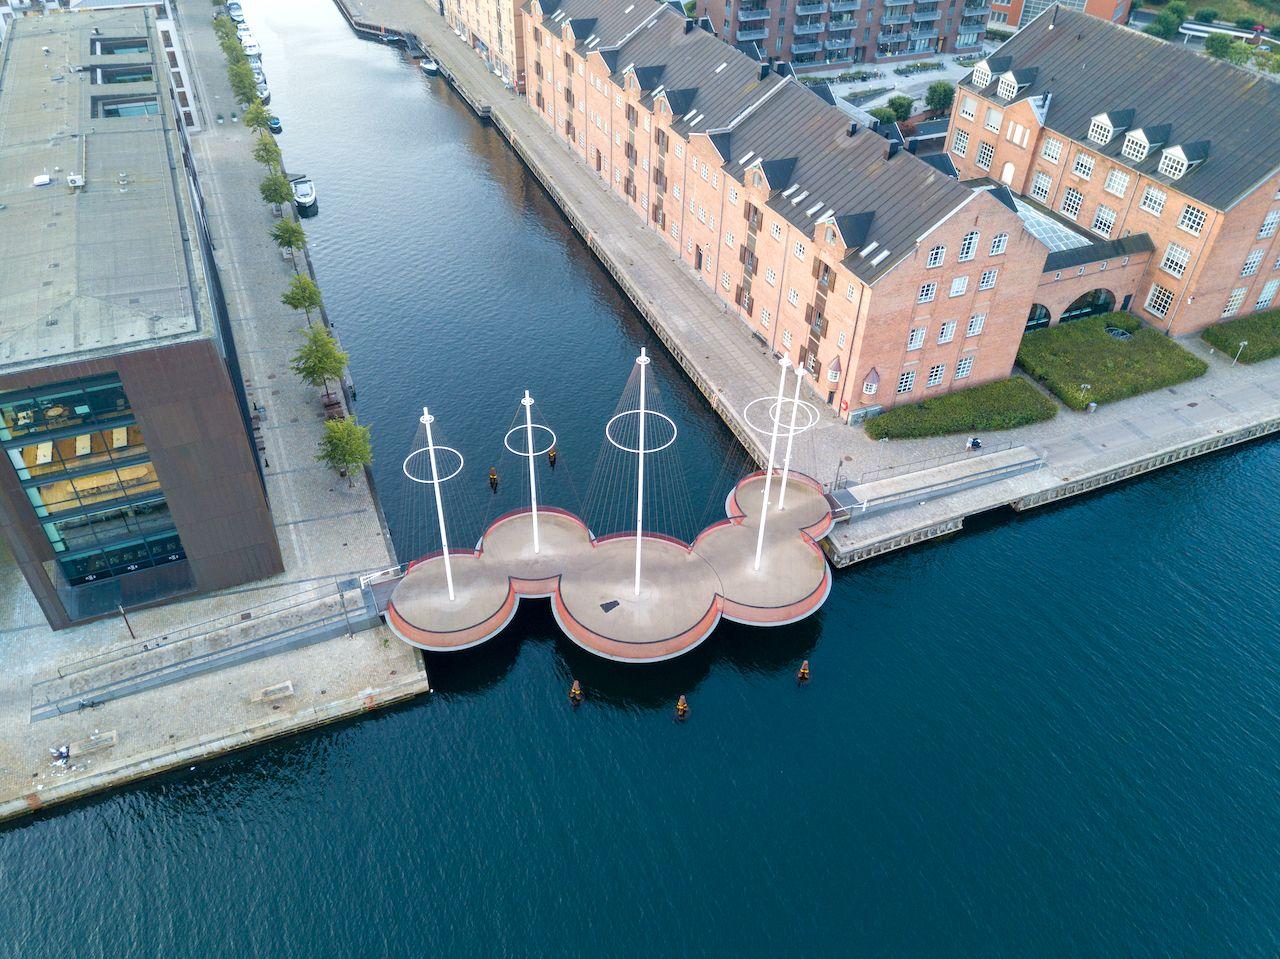 Copenhagen, Denmark - May 27, 2019: Aerial drone view of the modern Circle Bridge, a pedestrian bridge in the harbour area., Denmark architecture